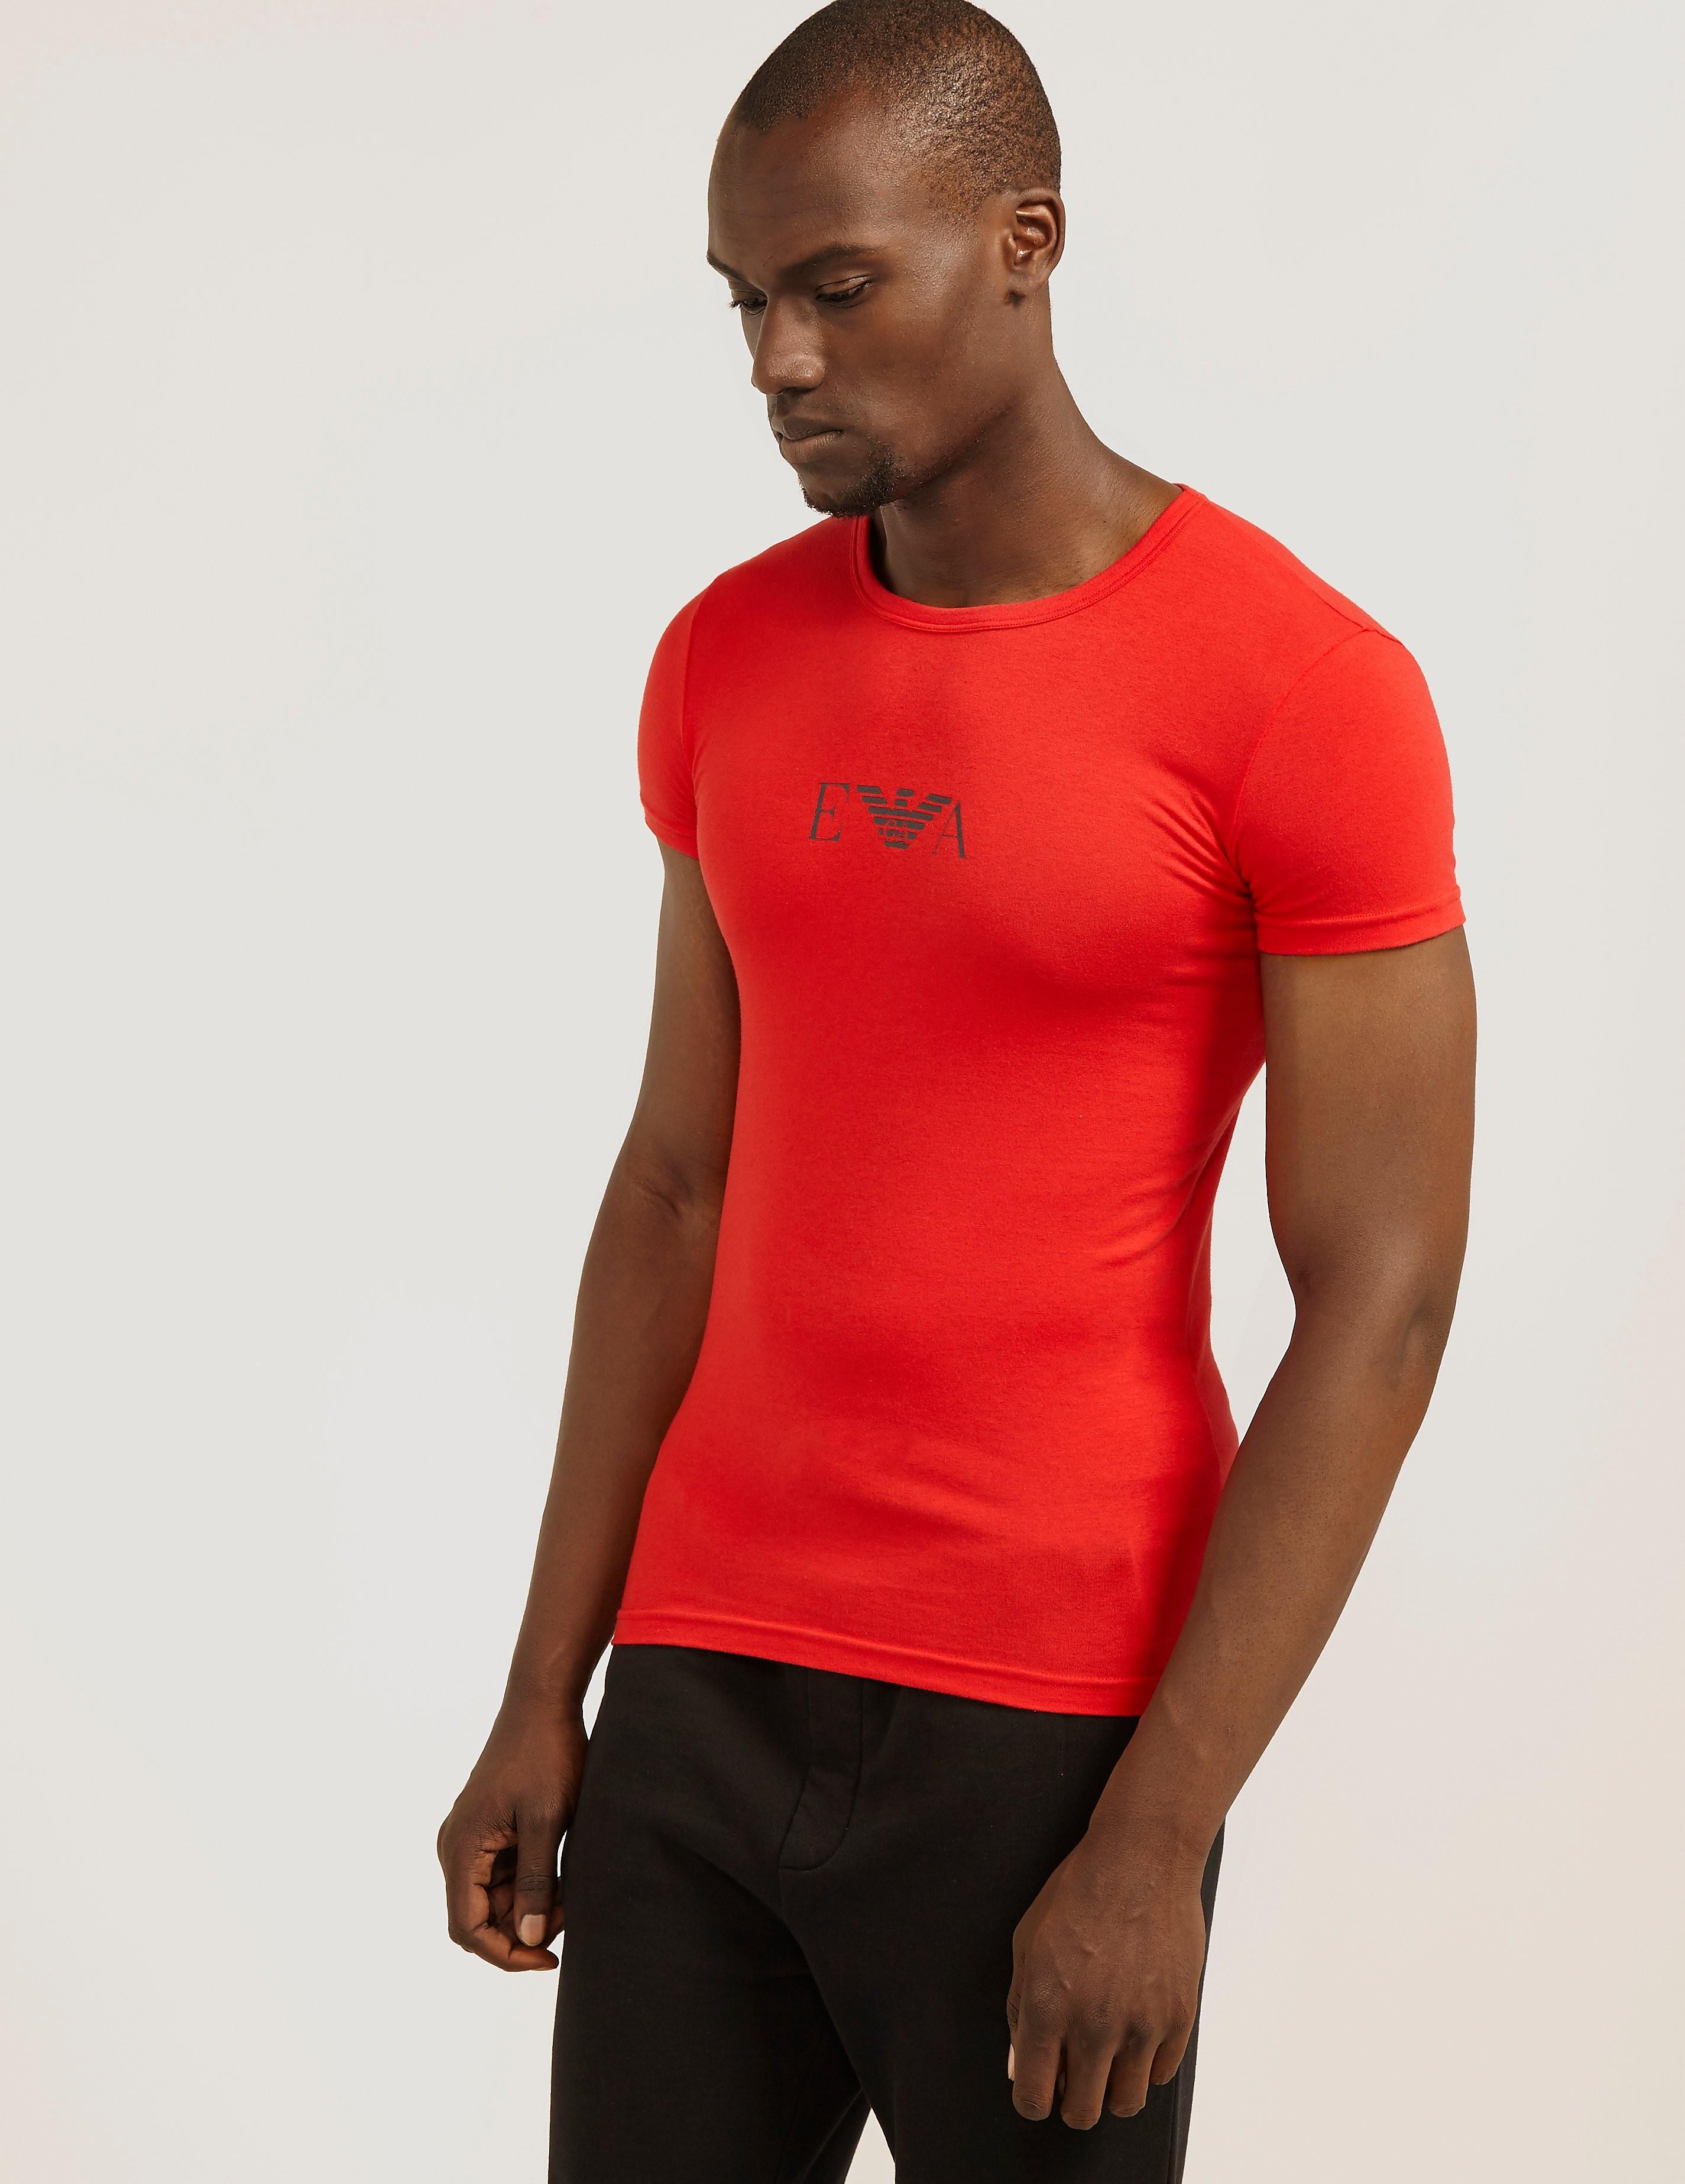 Emporio Armani Chest Eagle Short Sleeve T-Shirt